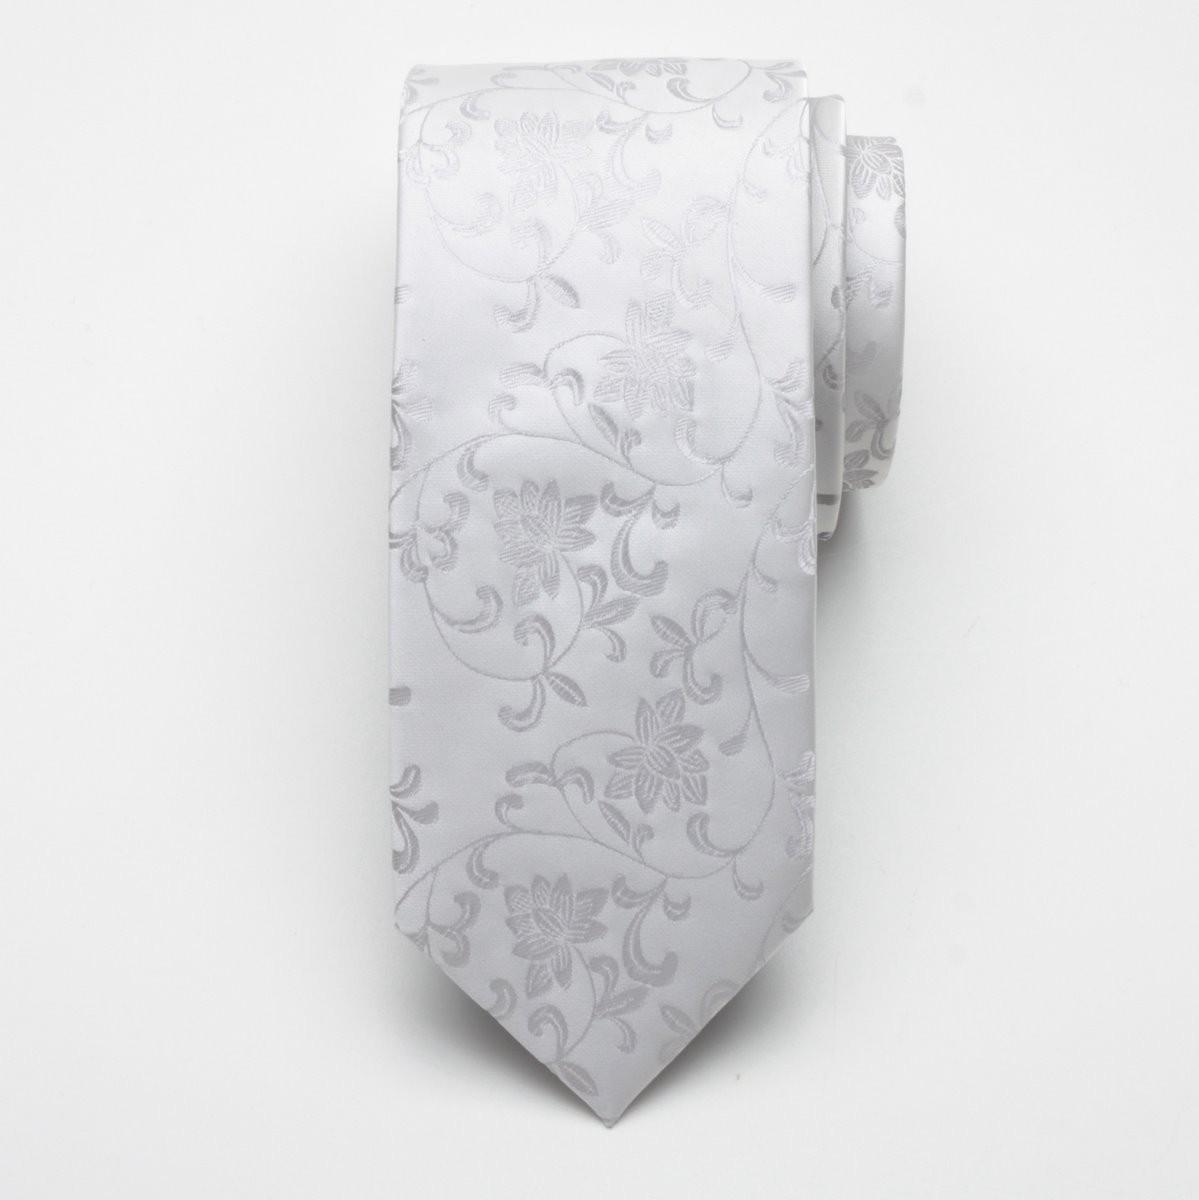 Krawat ślubny (wzór 6)